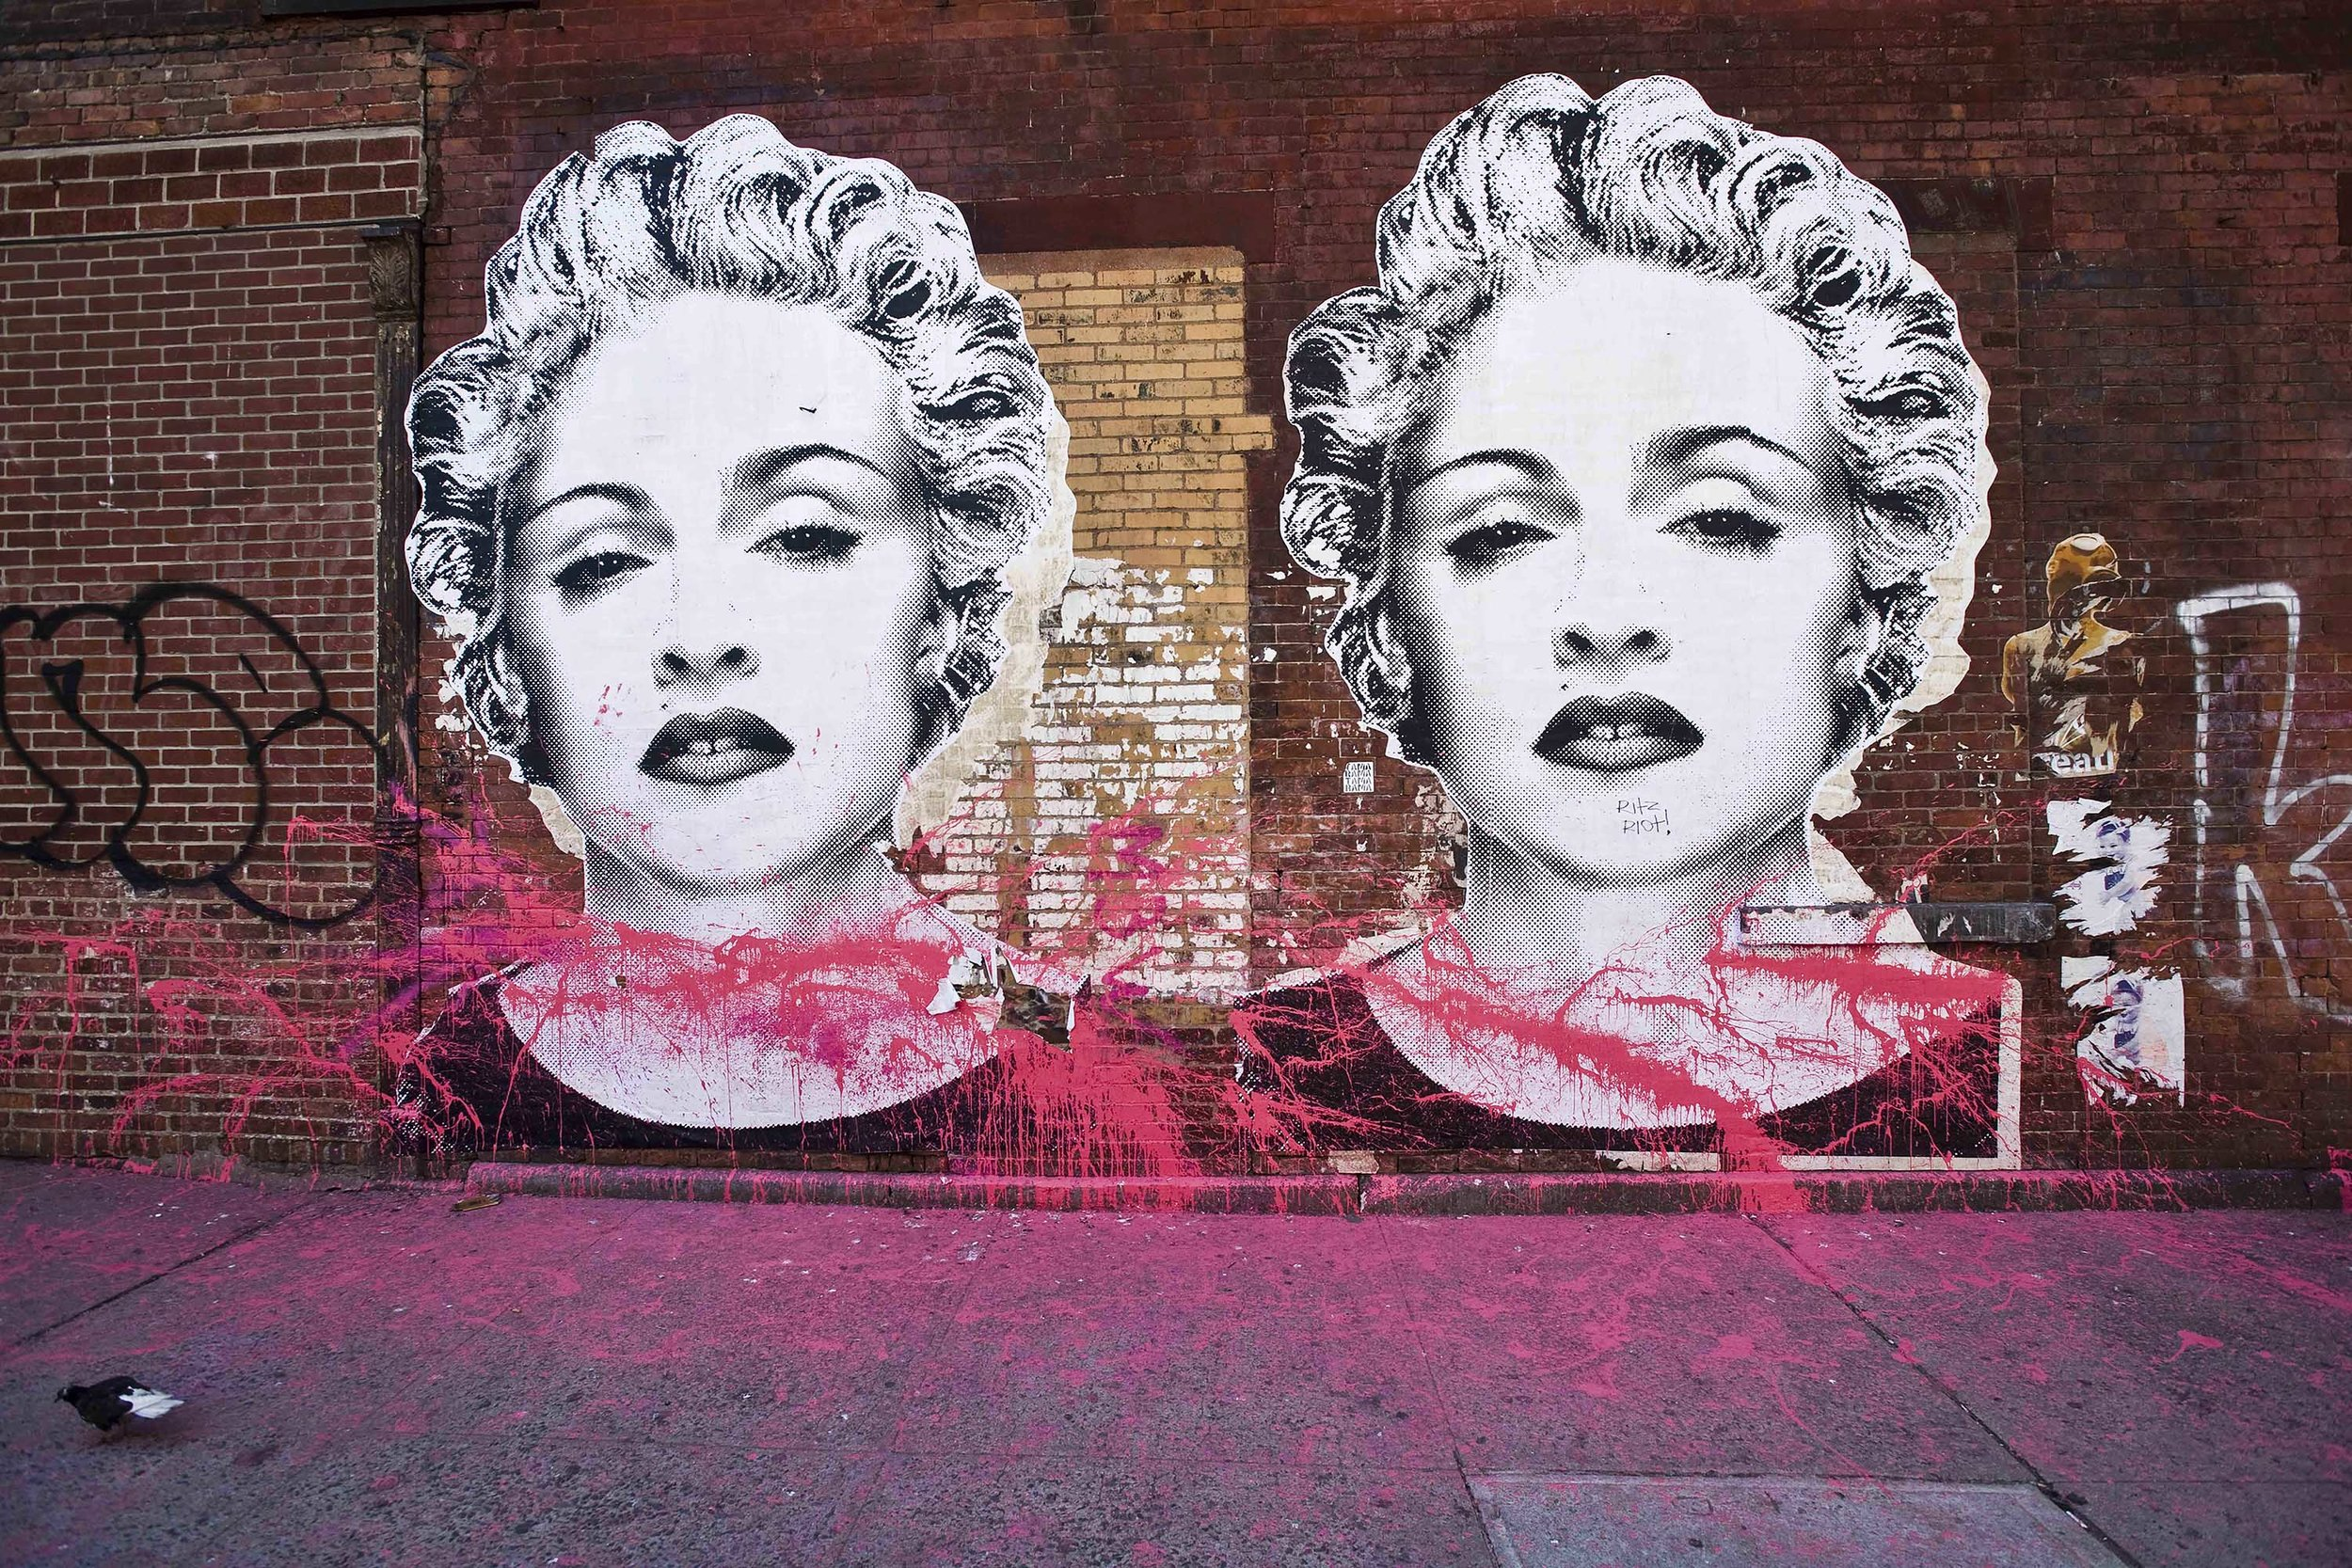 Madonna NYC 10-11-09.jpg